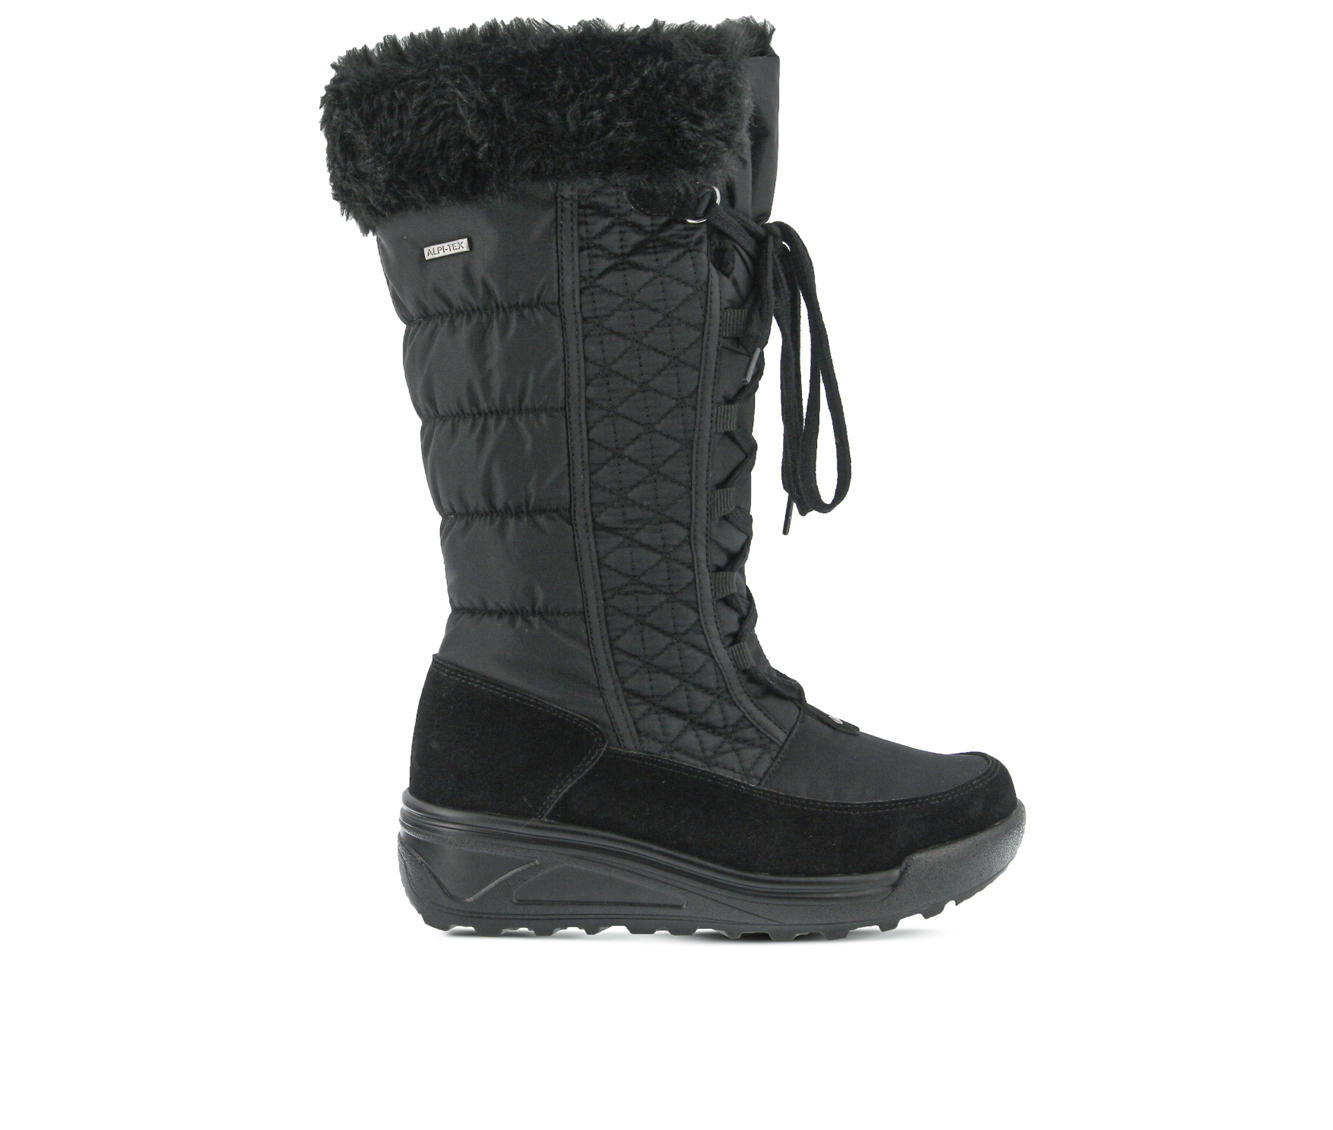 Flexus Fotios Women's Boots (Black Canvas)